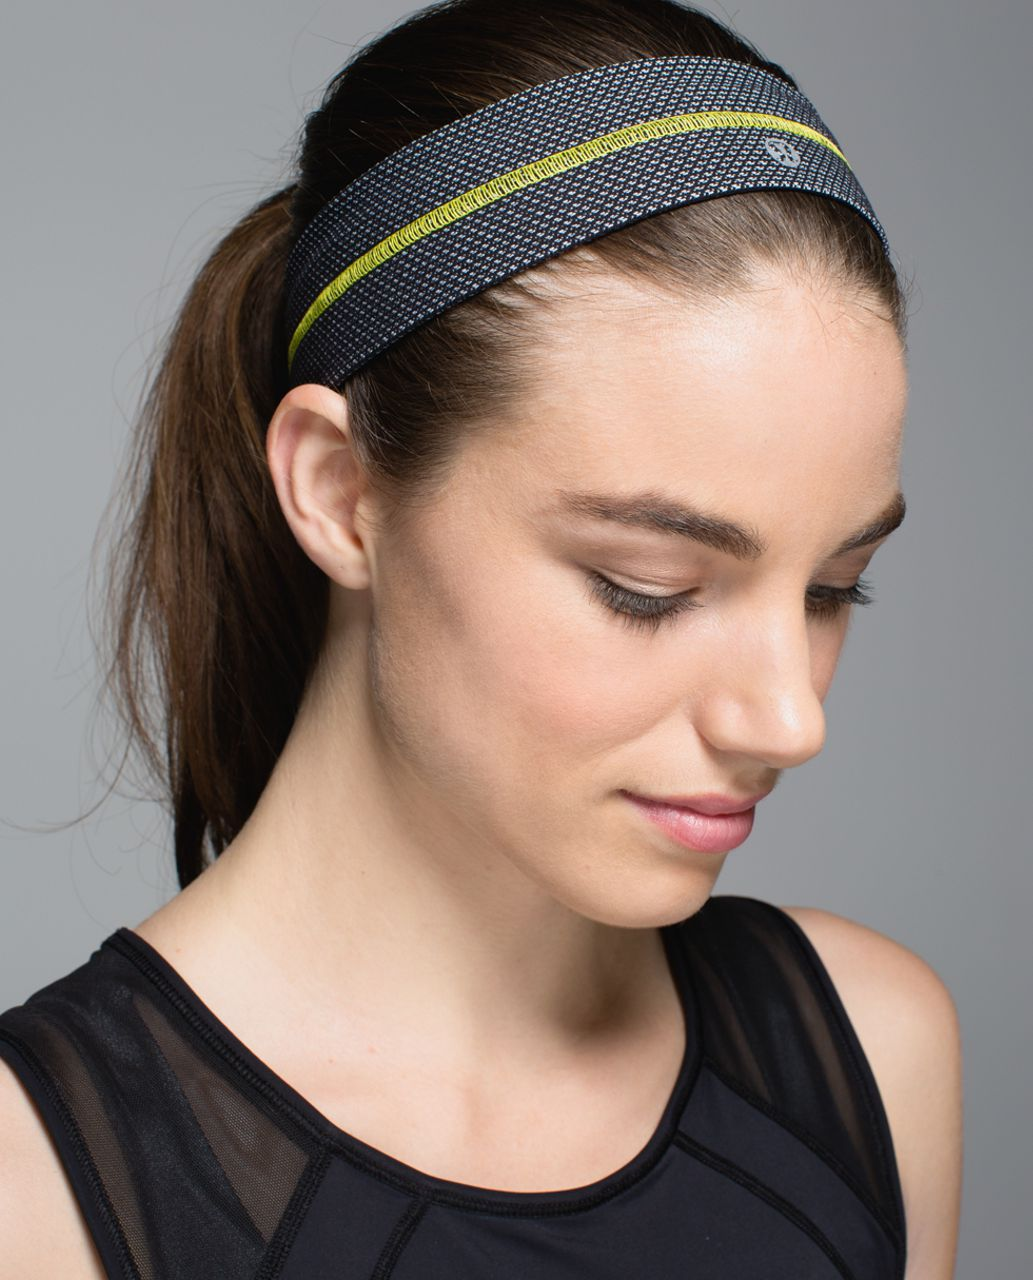 Lululemon Fly Away Tamer Headband - Cross Stitch Black White